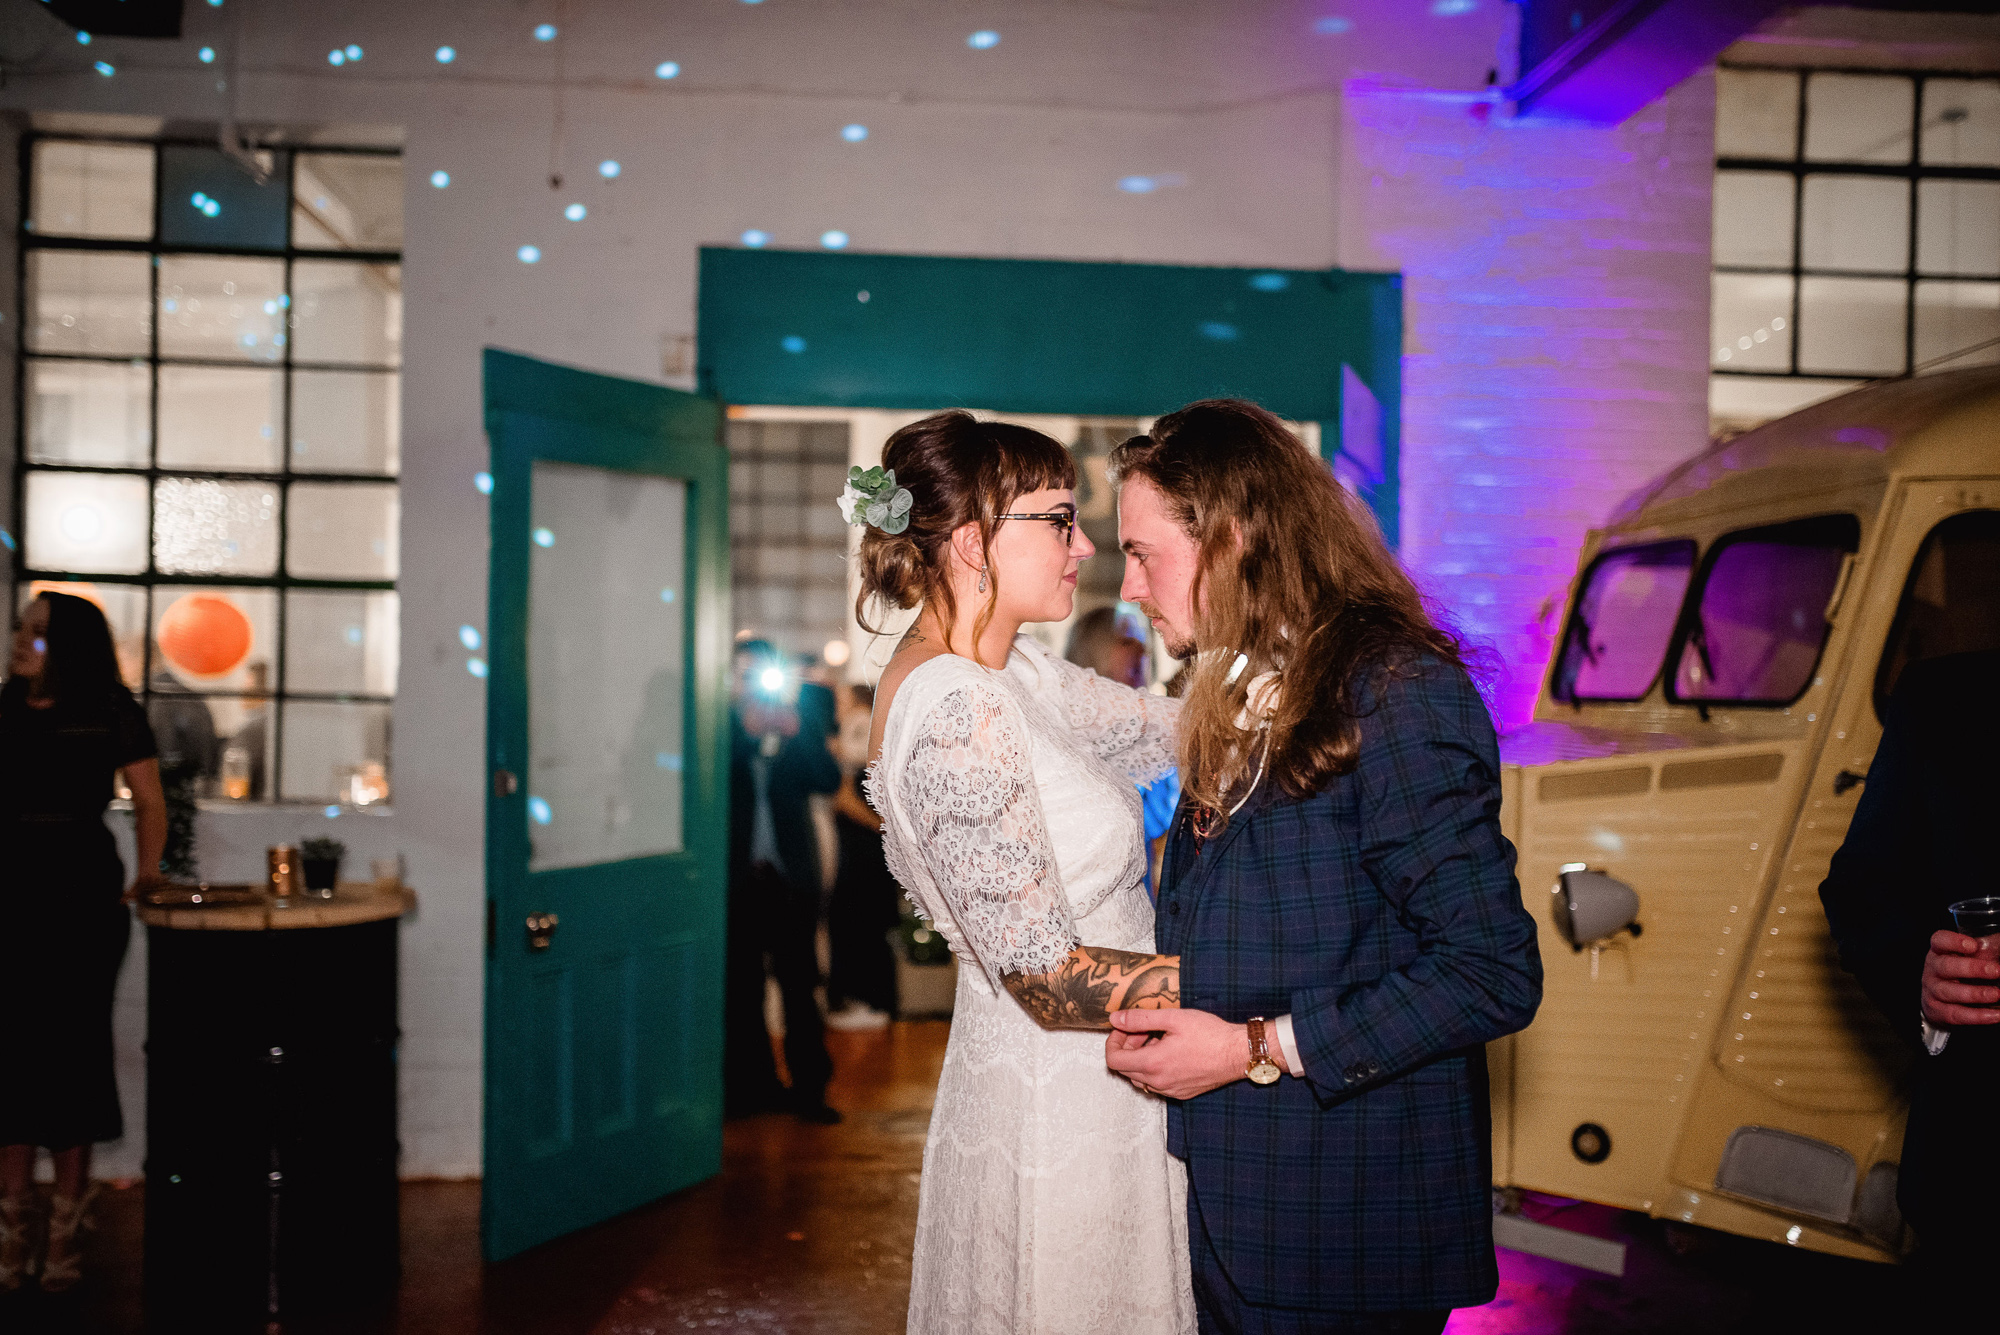 Harriet-Dahlia-Bespoke-Lace-Silk-Bohemian-Wedding-Dress-Sleeves-Tattooed-Bride-Alternative-Wedding-Sheffield-46.jpg